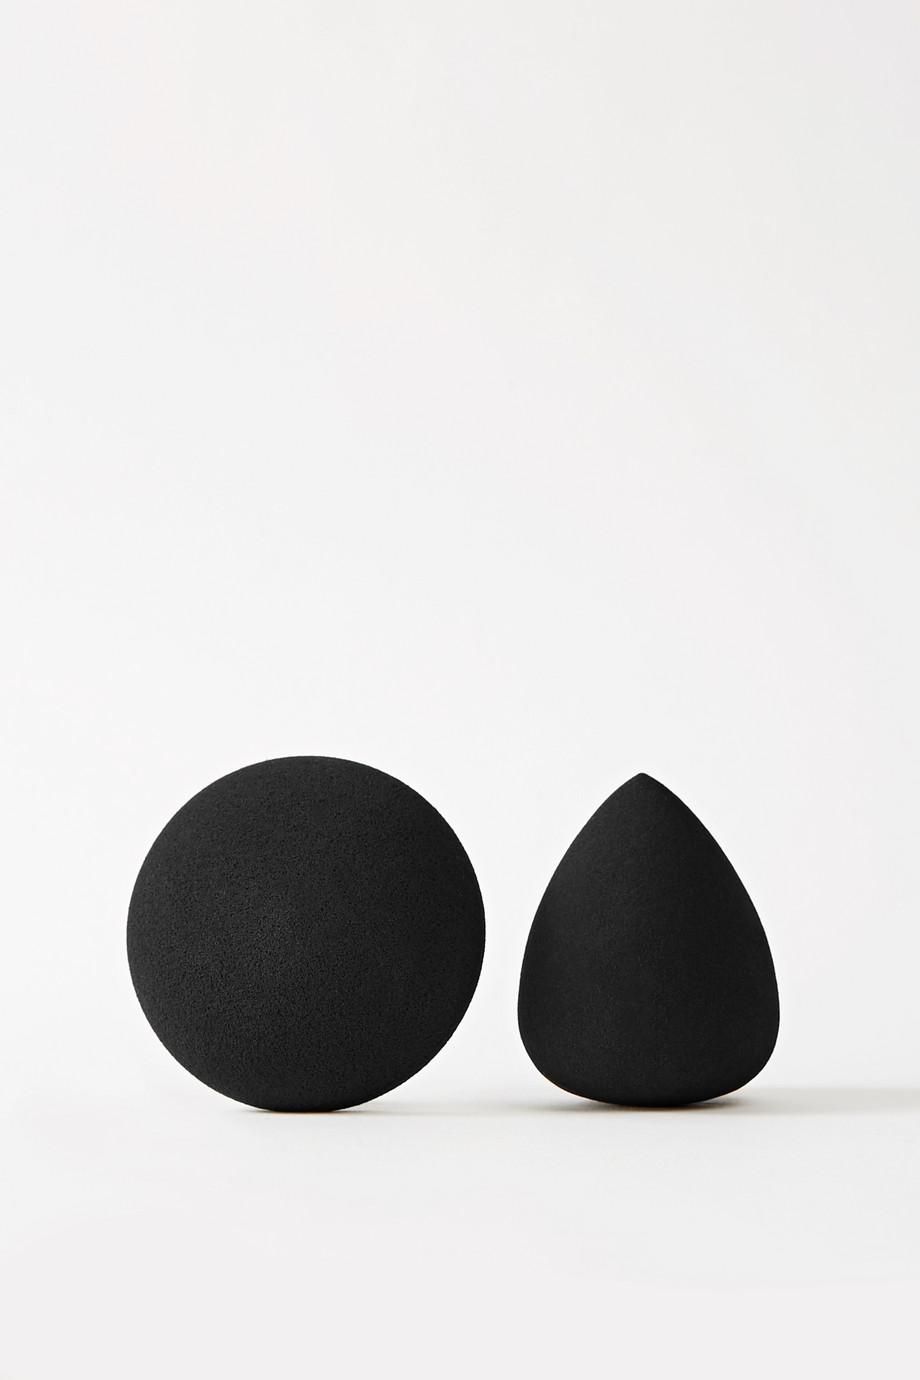 Serge Lutens The Blenders Pro - Flawless Complexion Sponge Set